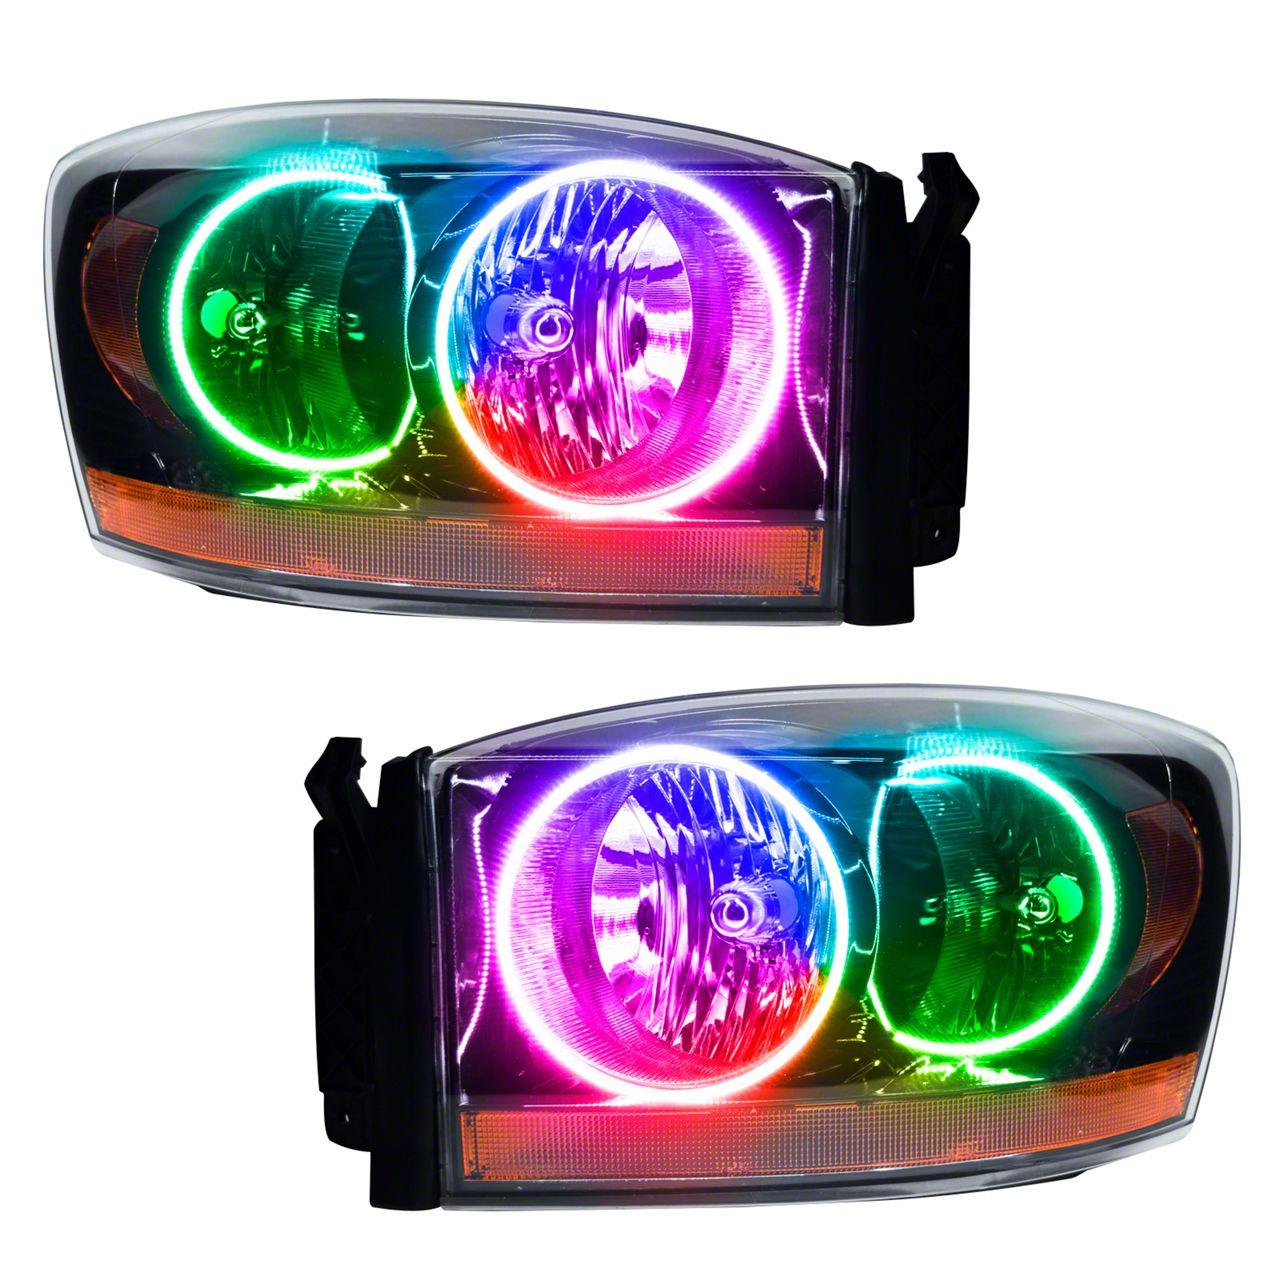 Oracle Black OE Style LED Halo Headlights - ColorSHIFT (2006 RAM 1500)